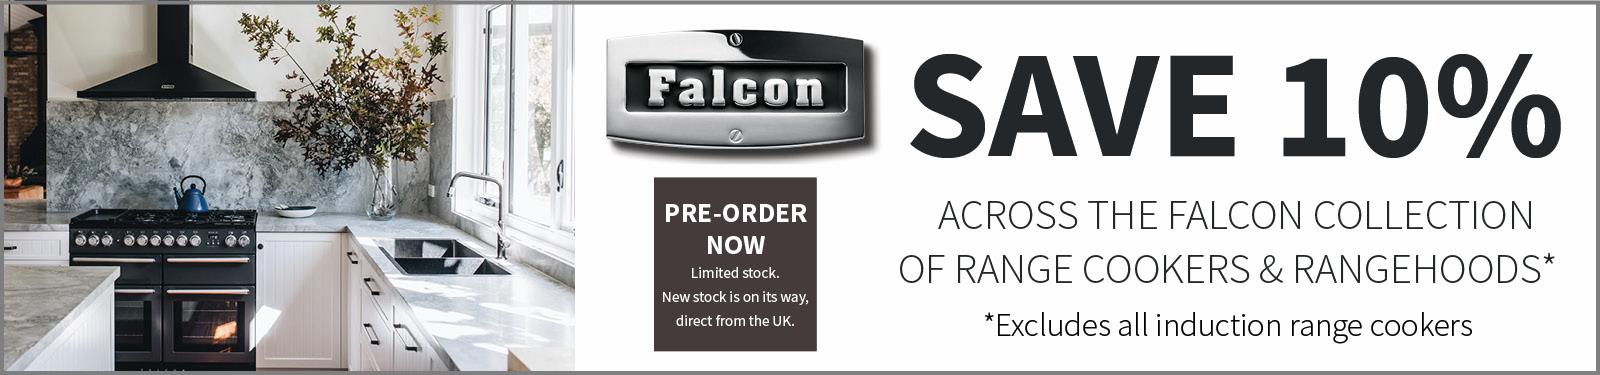 falcon-sep2021-promo-save10percent-spartan-web-banner-1600x375.jpg